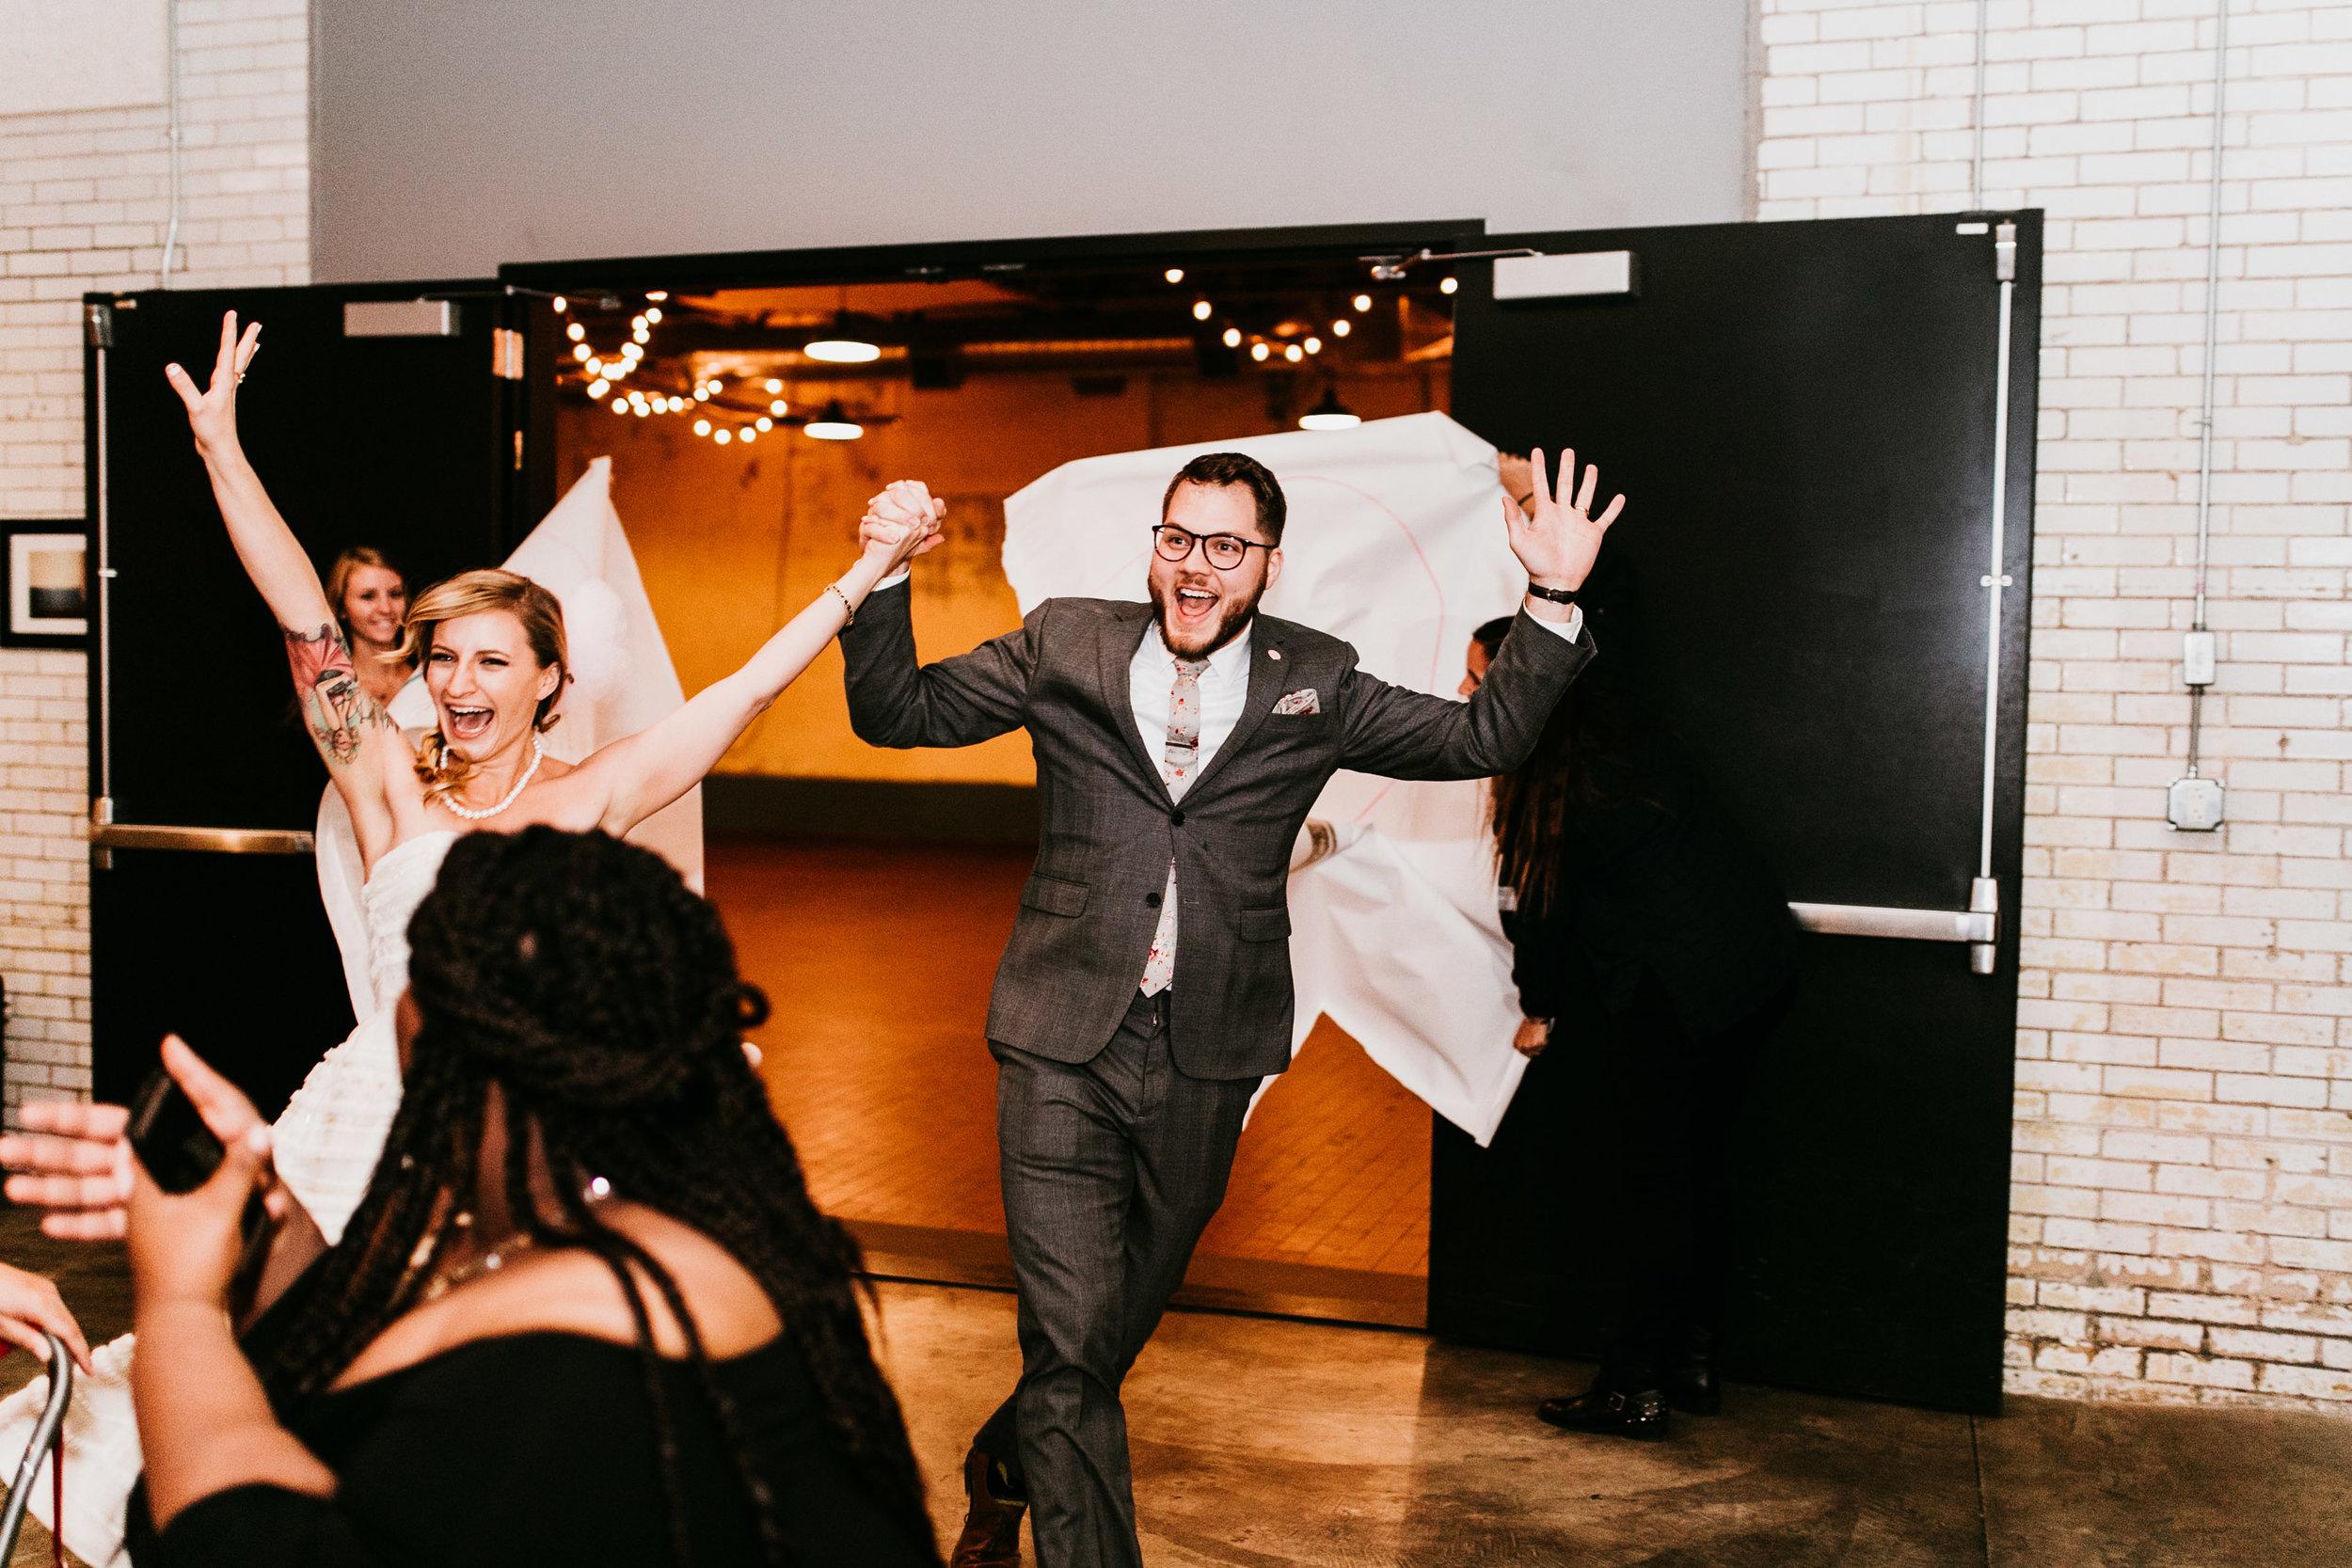 uprooted-traveler-vegan-suit-how-to-have-a-vegan-wedding.jpg